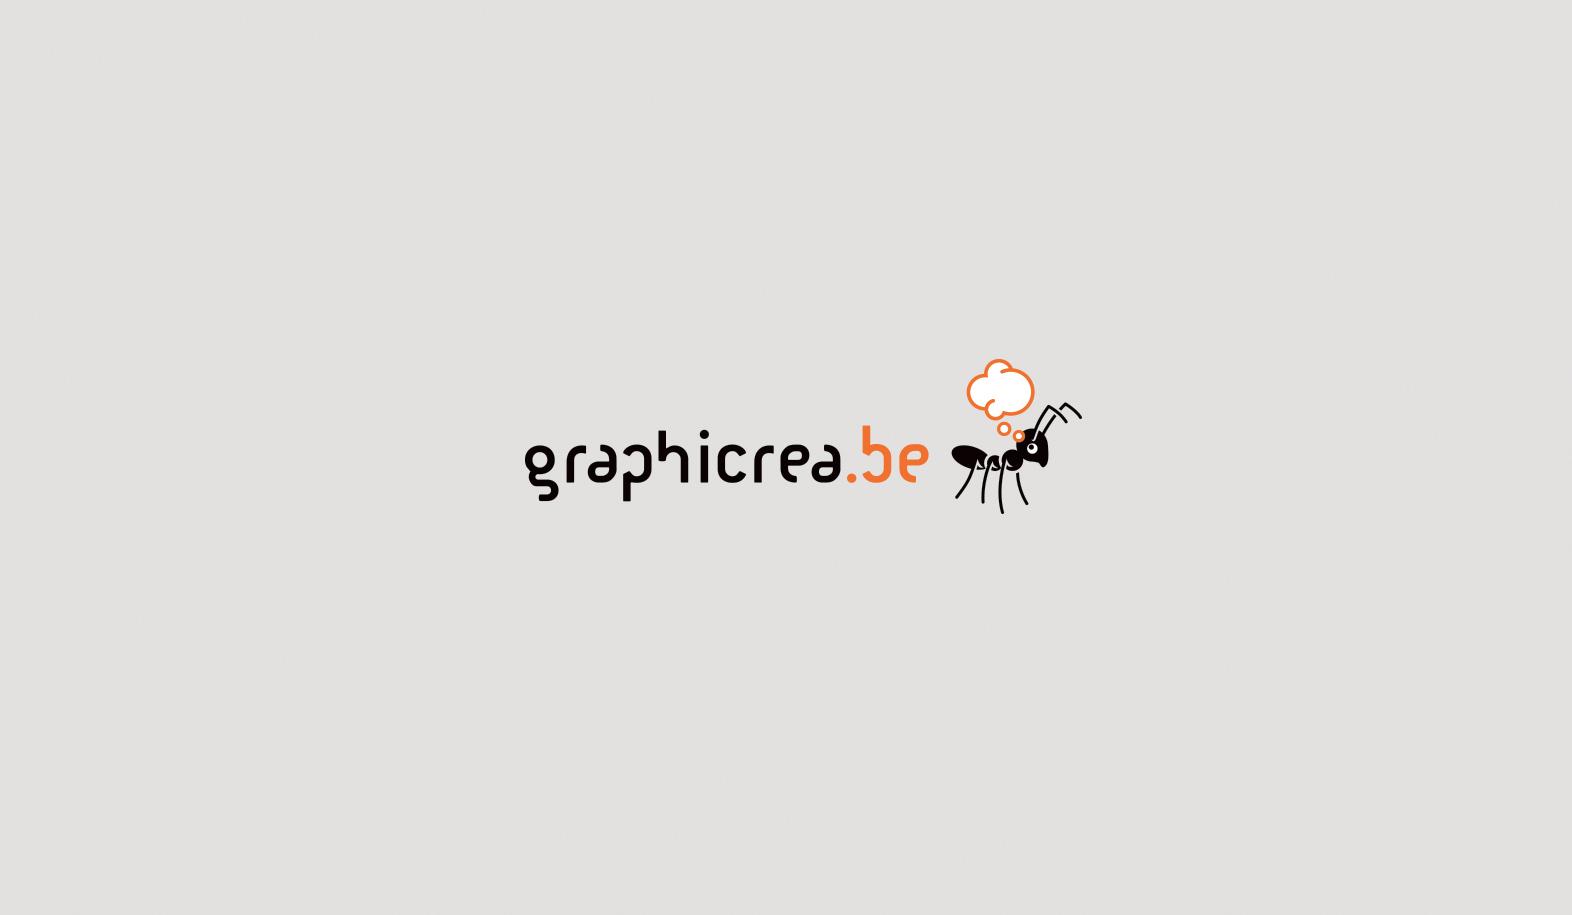 00-slide-generique_blanc-ok